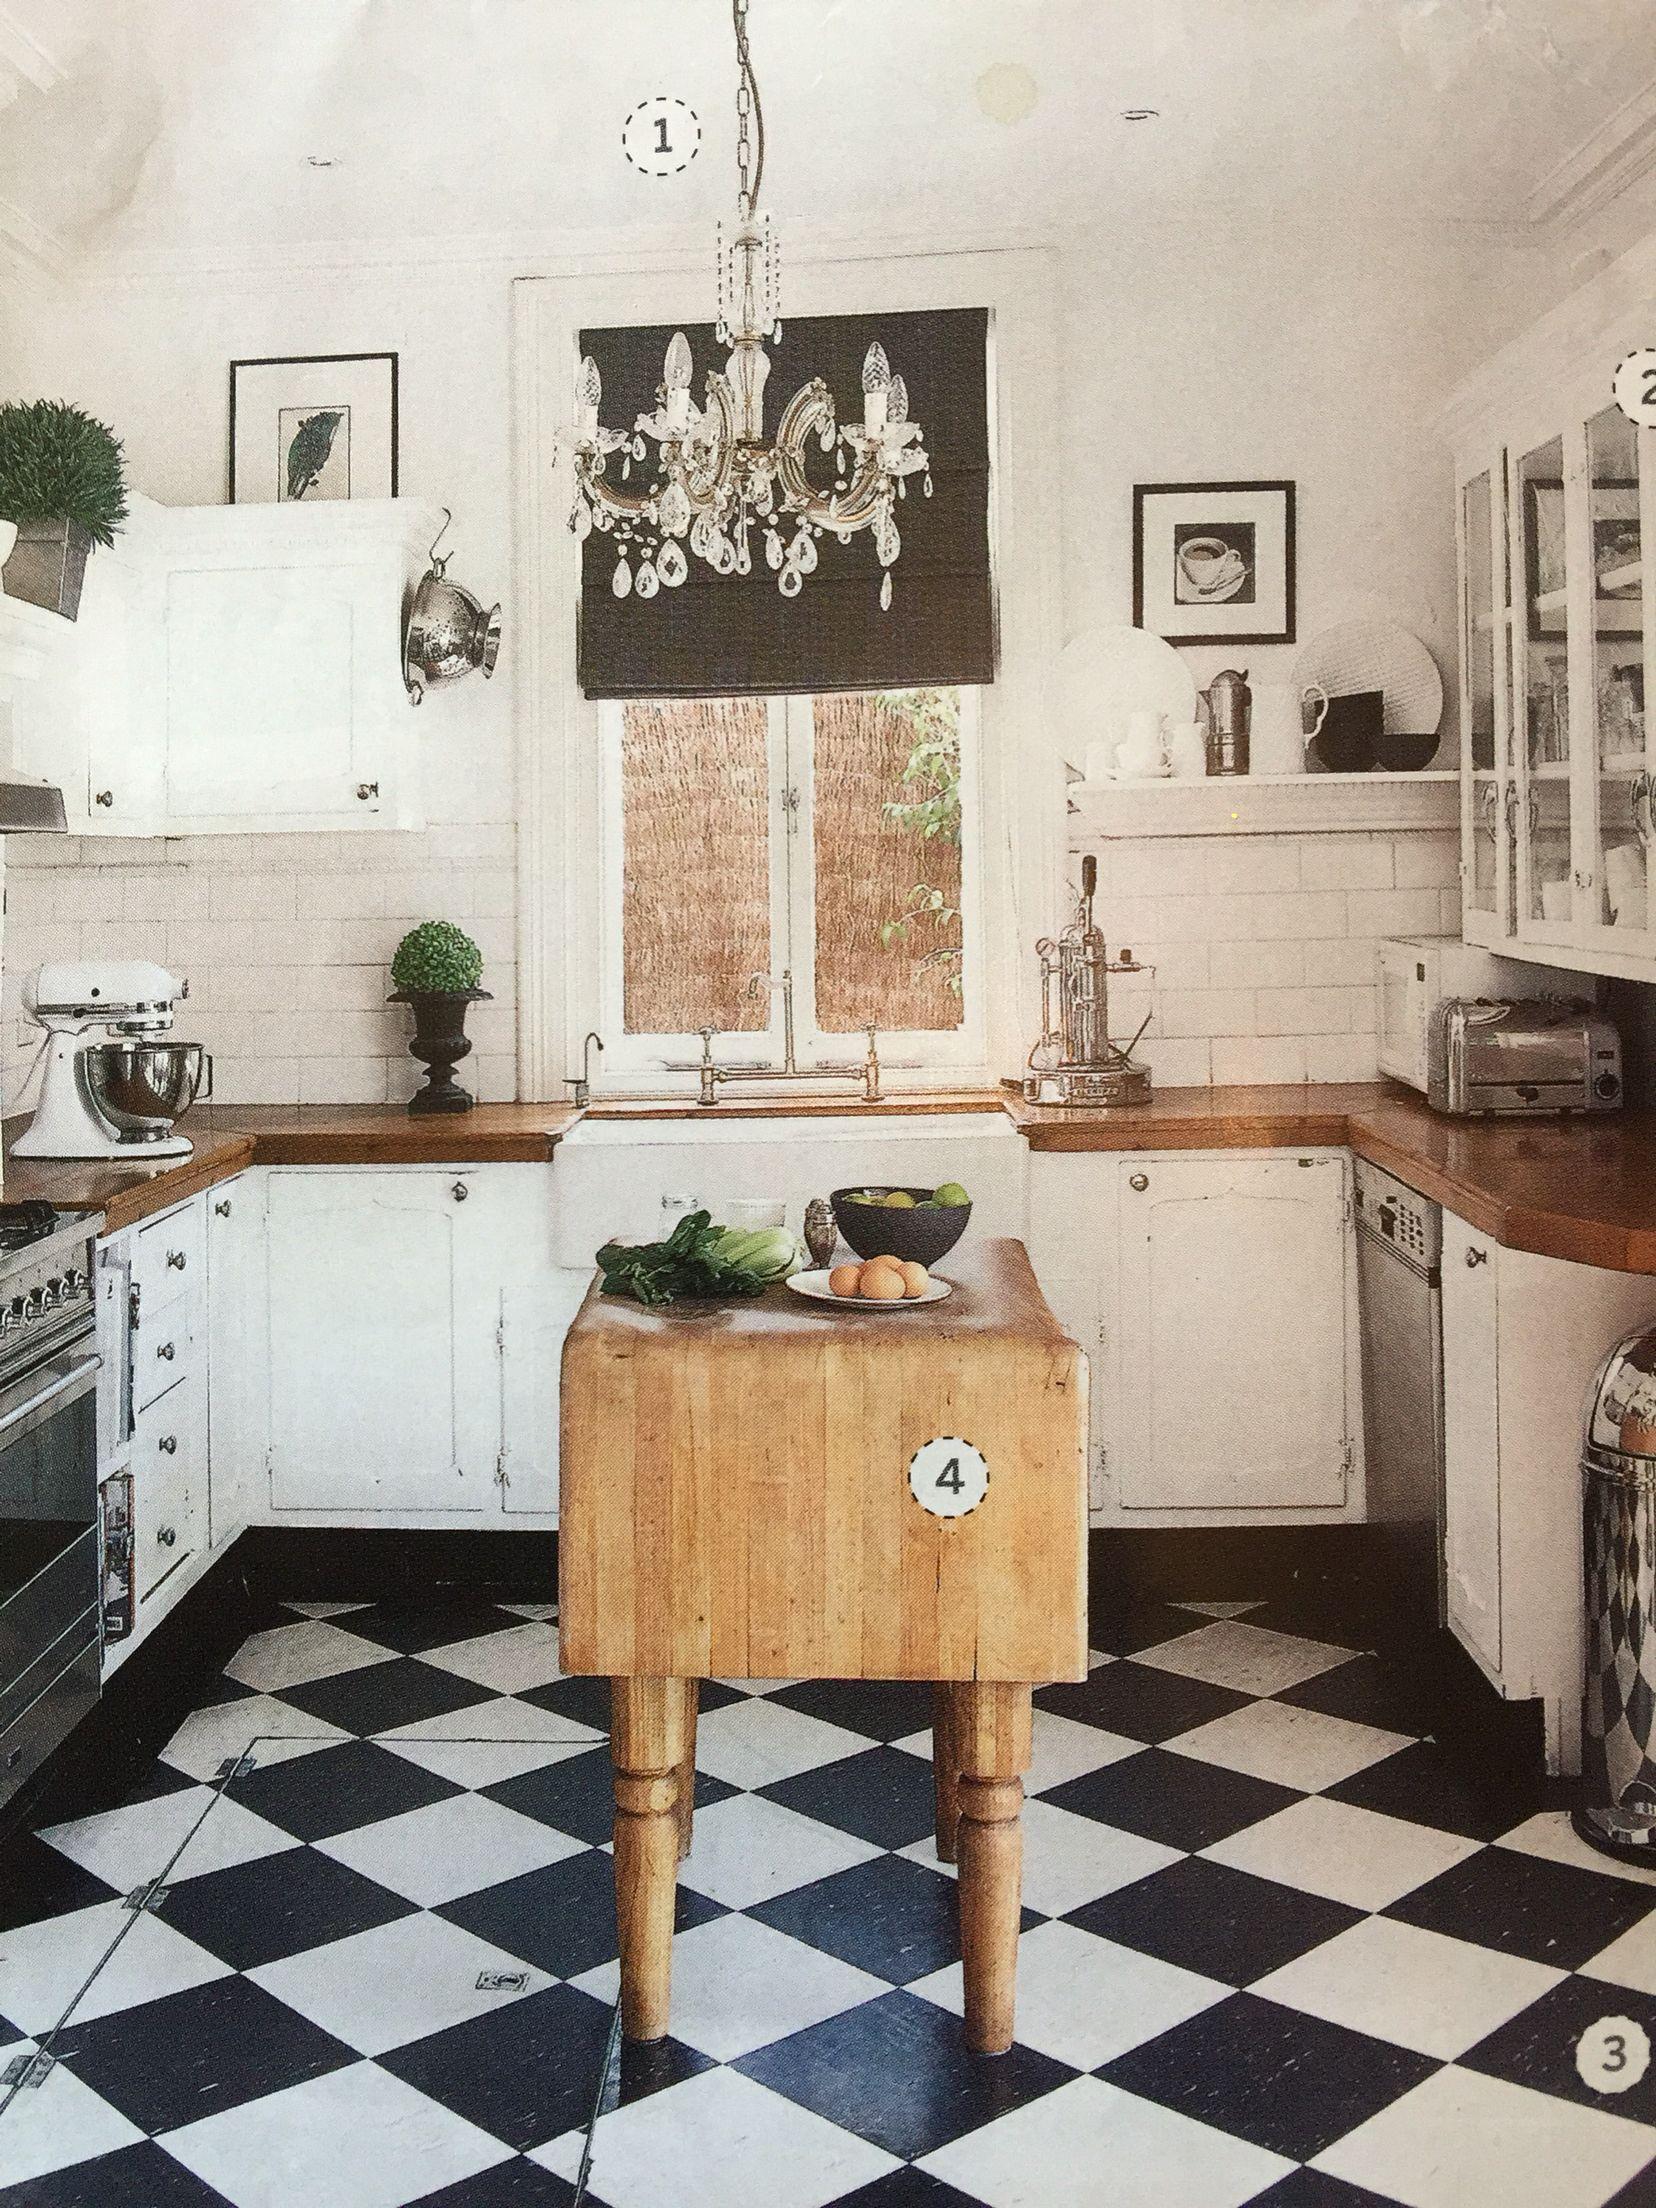 Rustic Kitchen Magazine Clipping From Home Beautiful White Kitchen Floor Kitchen Flooring Black White Kitchen